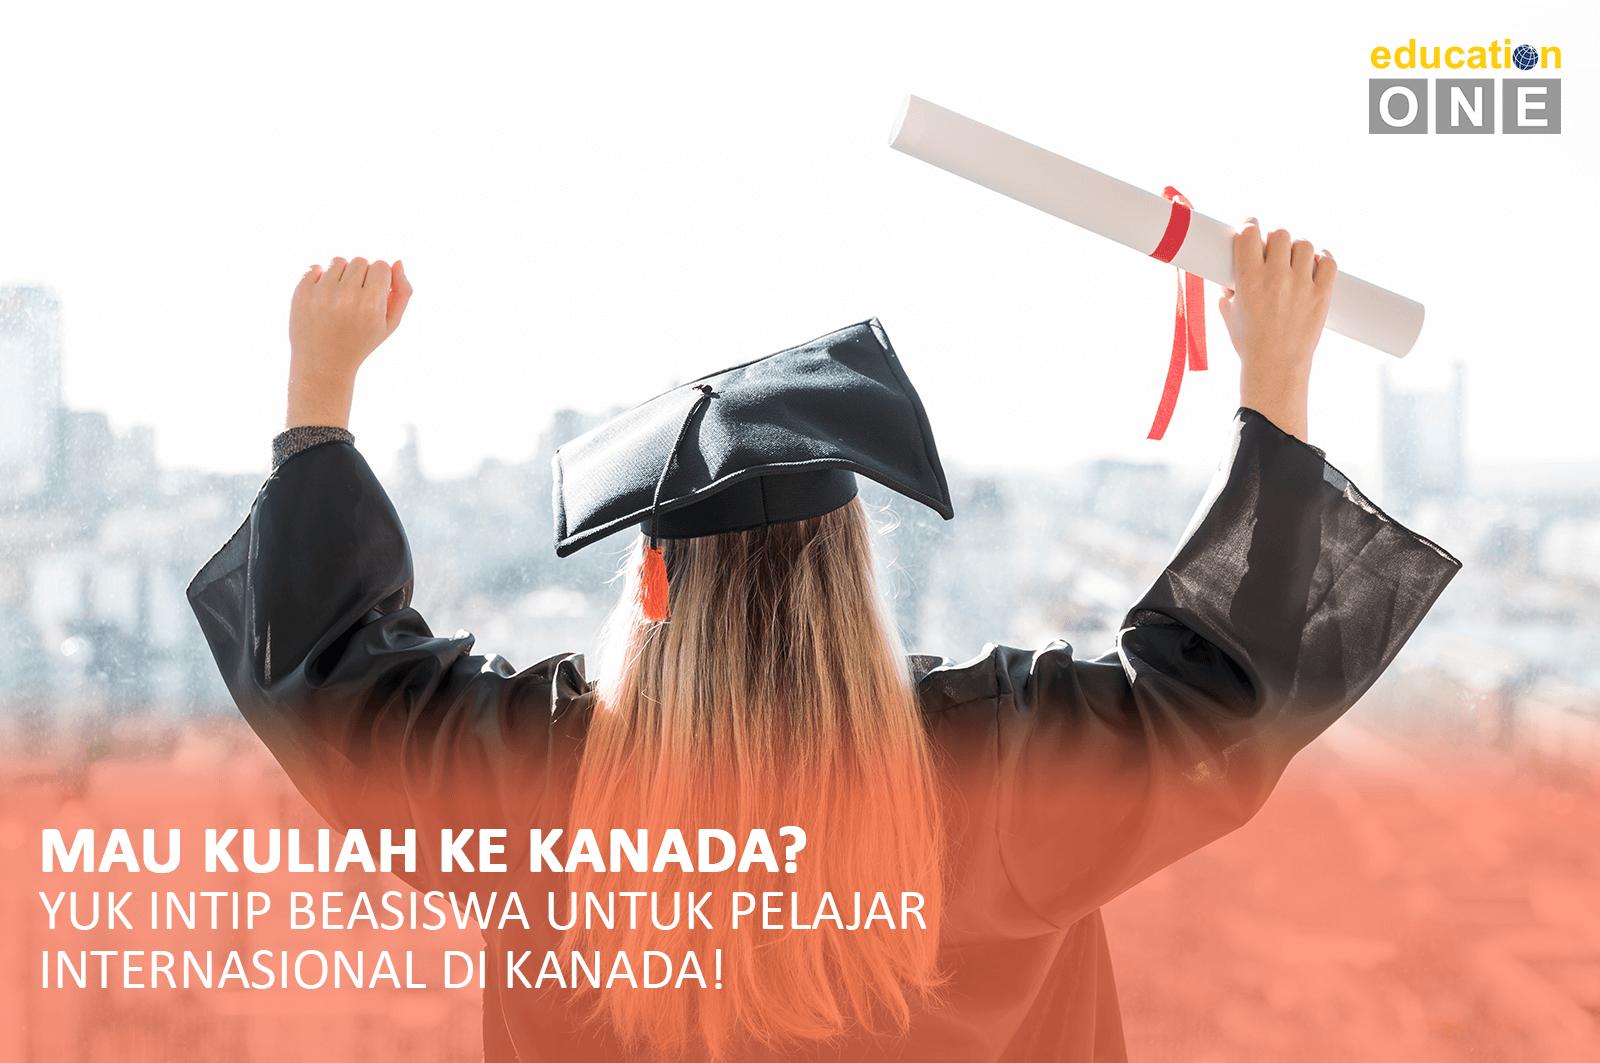 Beasiswa untuk pelajar international di kanada